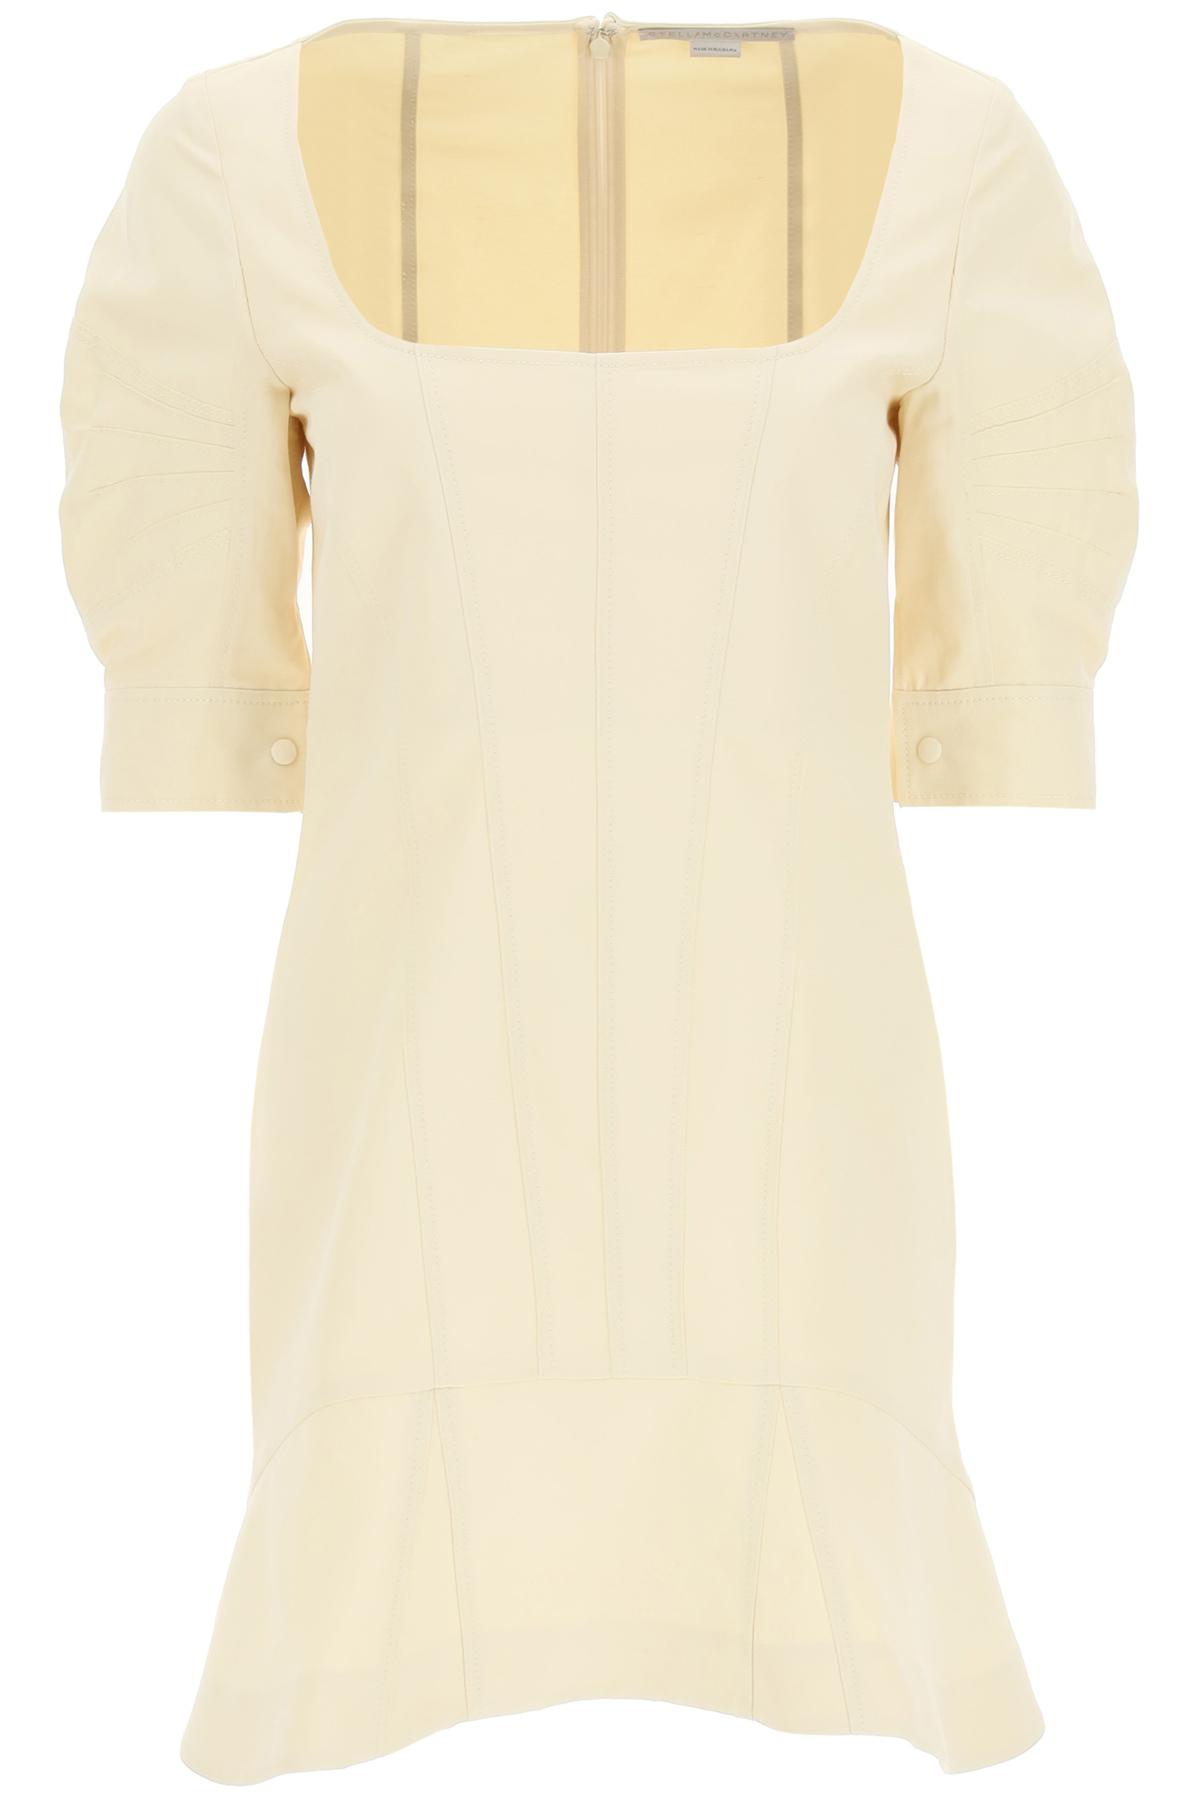 Stella mccartney mini abito angelina